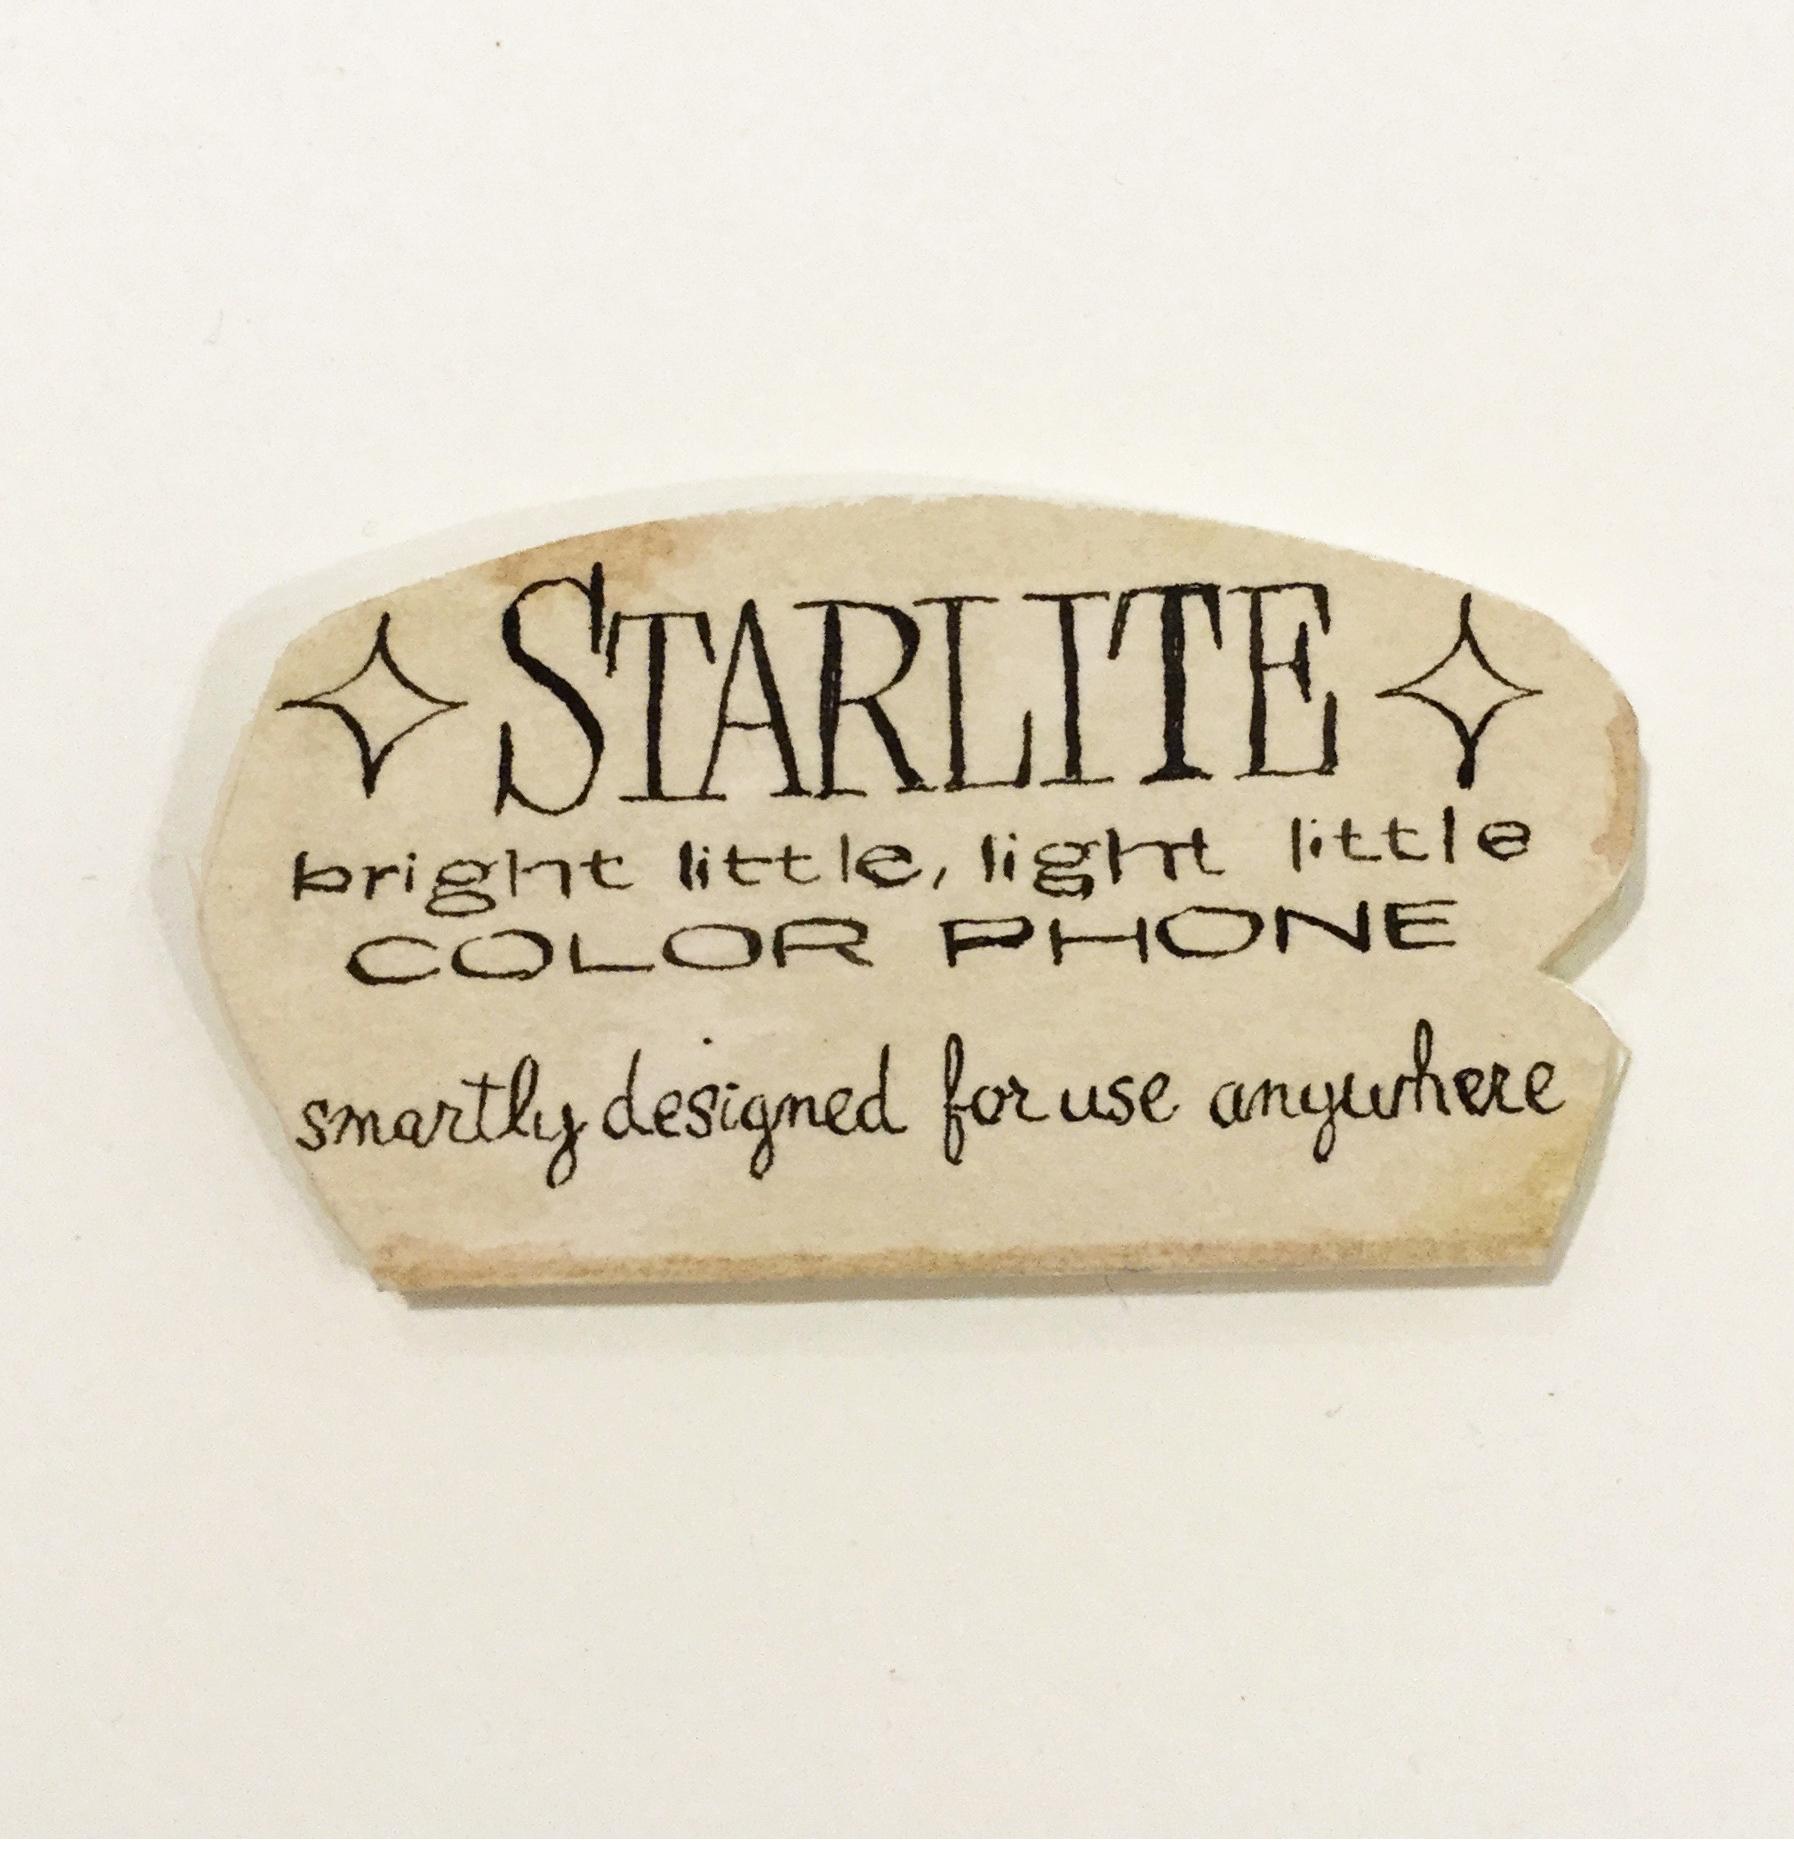 Starlite2.jpg